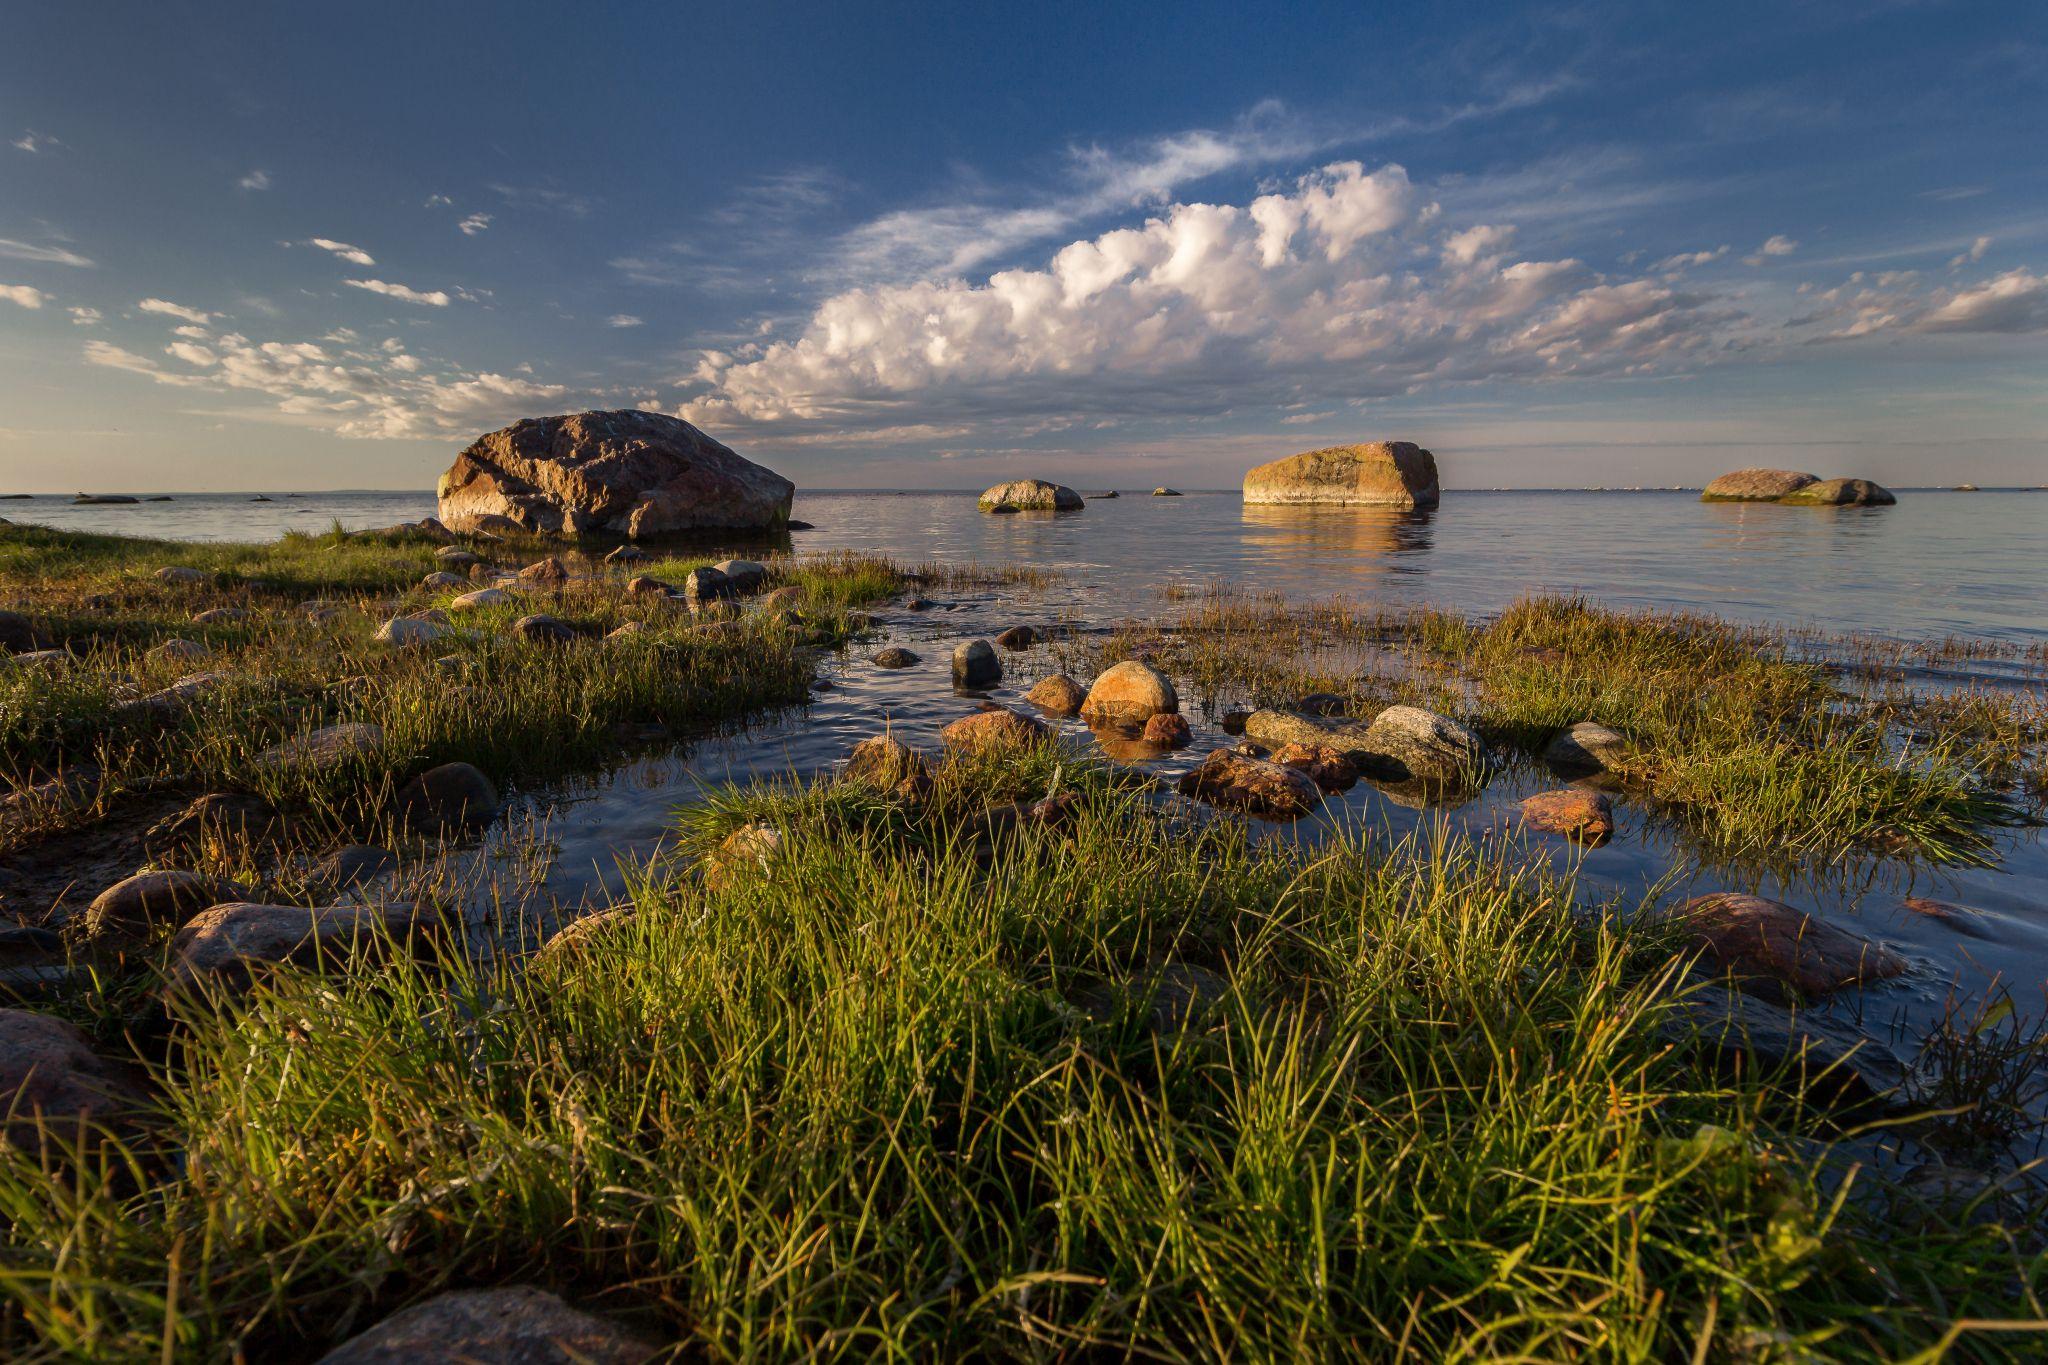 Beach on the Karavaldai Peninsula in the Leningrad Region, Russian Federation